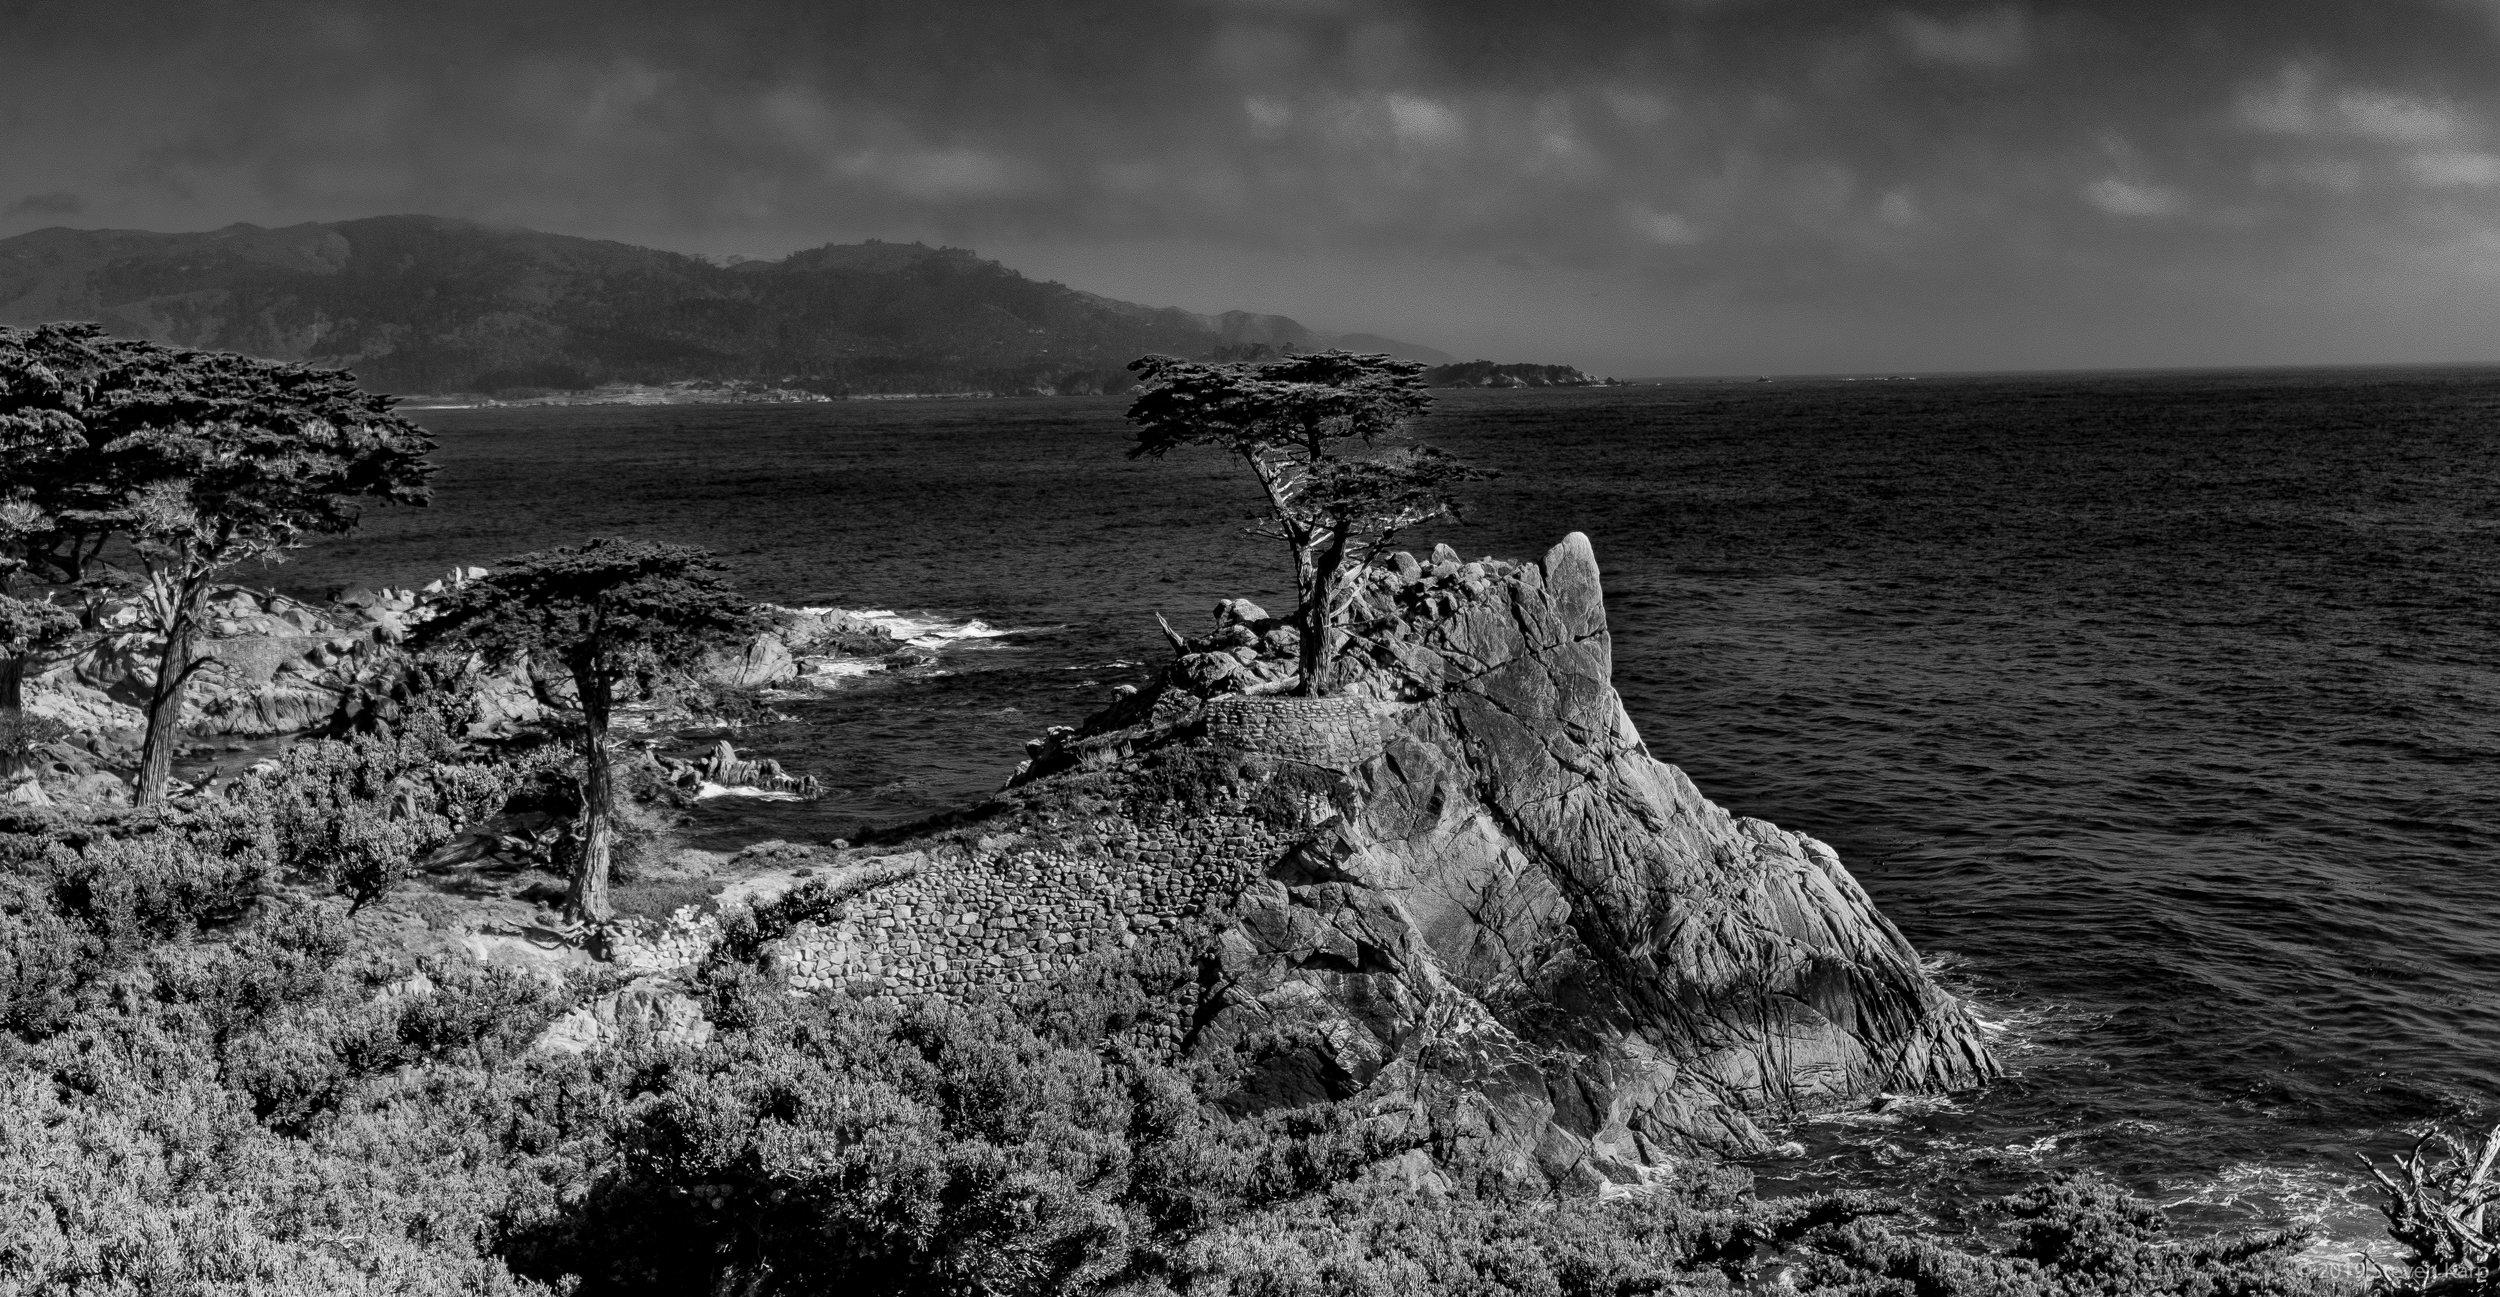 Lone Cypress ©2019 S. Karp